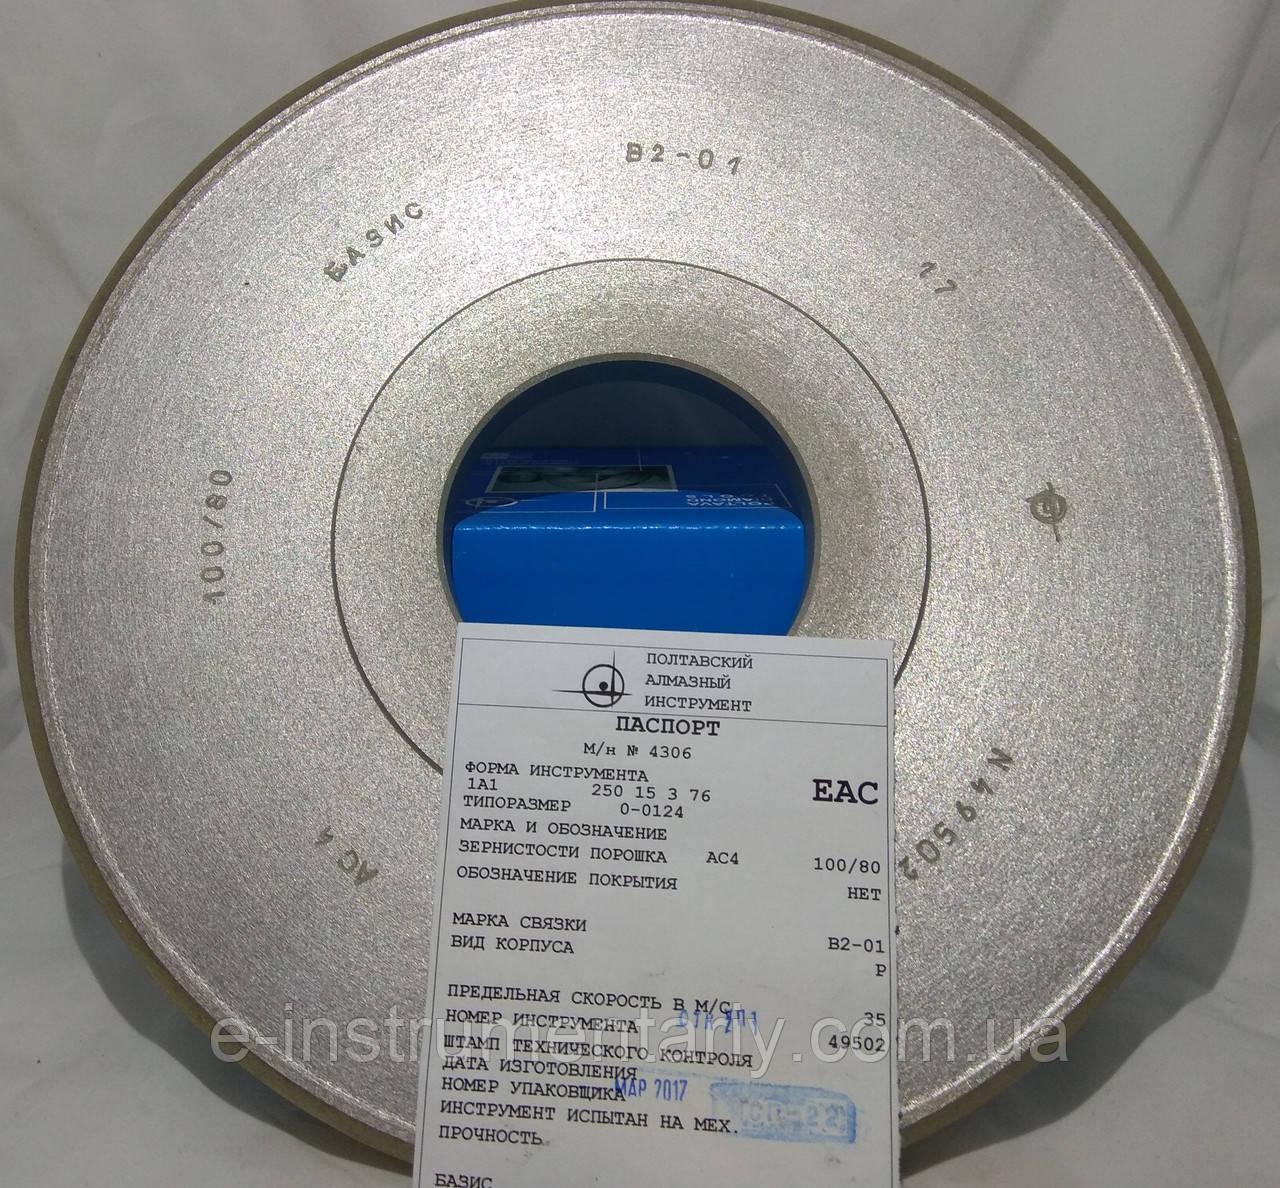 Круг алмазный прямой профиль (1А1) 250х15х3х76  Базис АС4 Связка В2-01